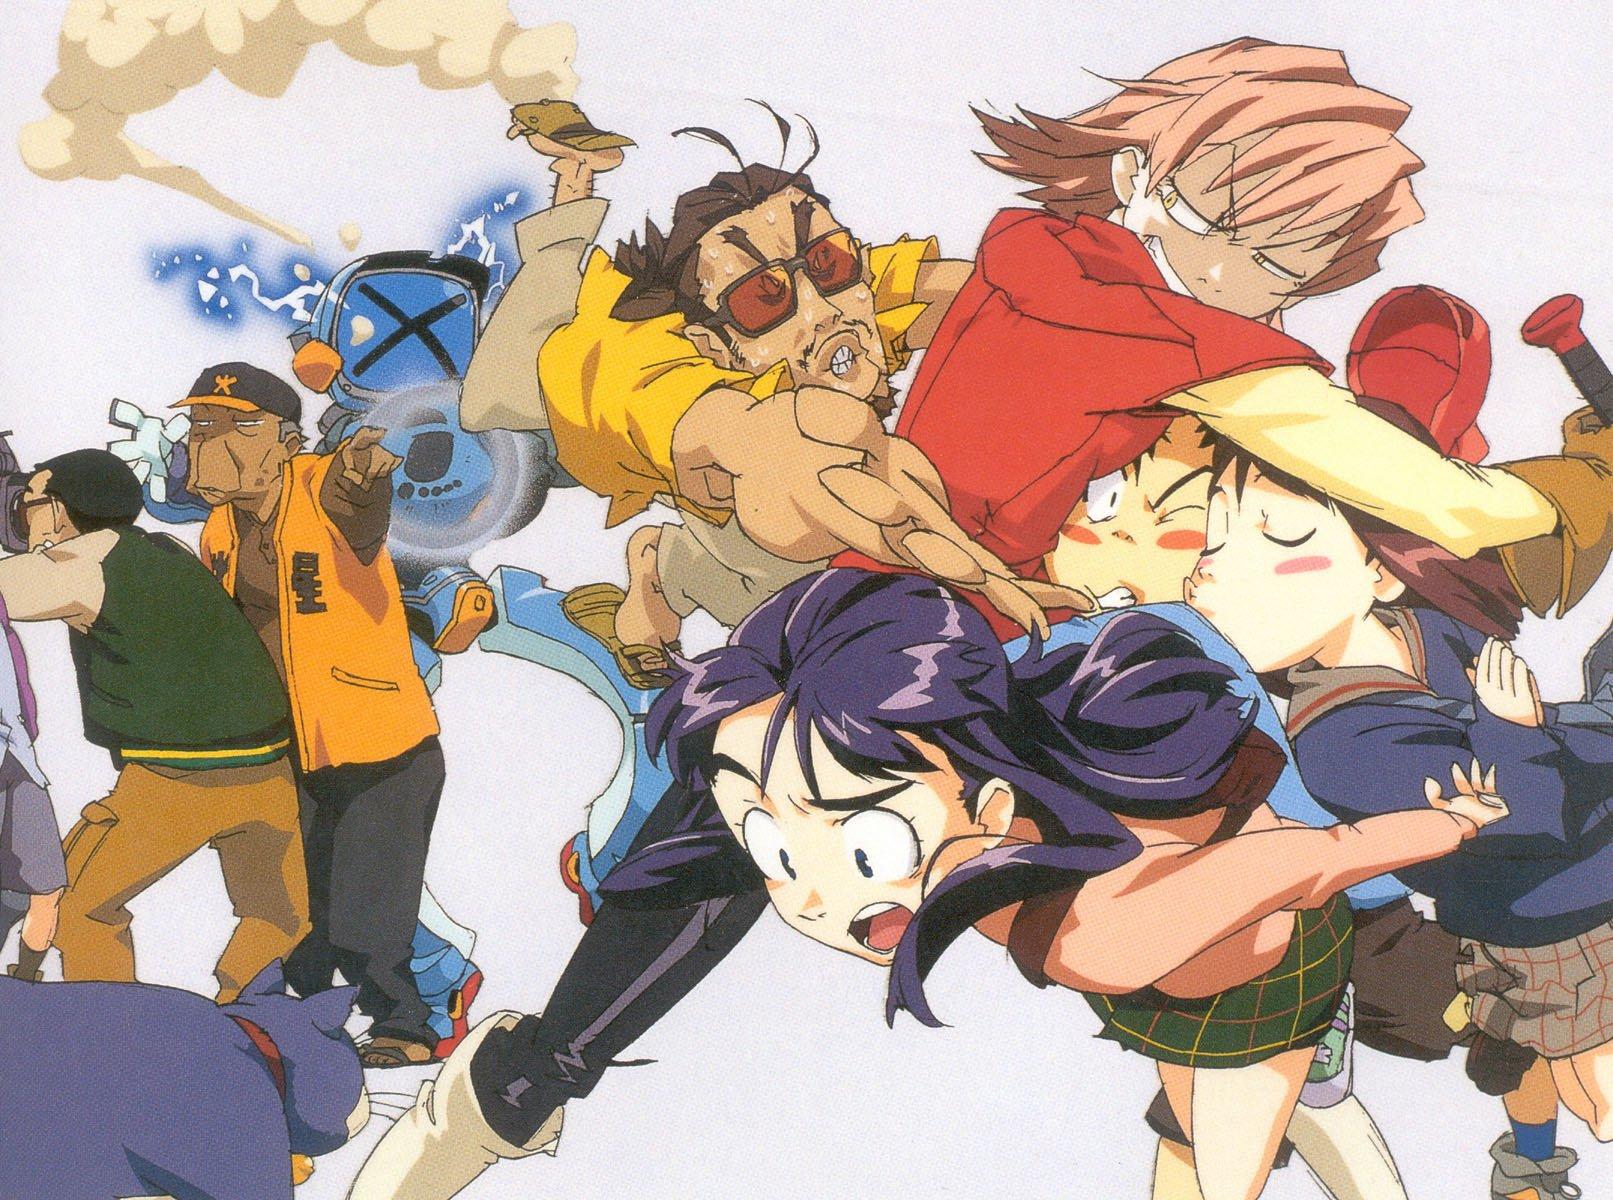 http://www.animextremist.com/artbooks/flcl-artbook/flclartbook17.jpg